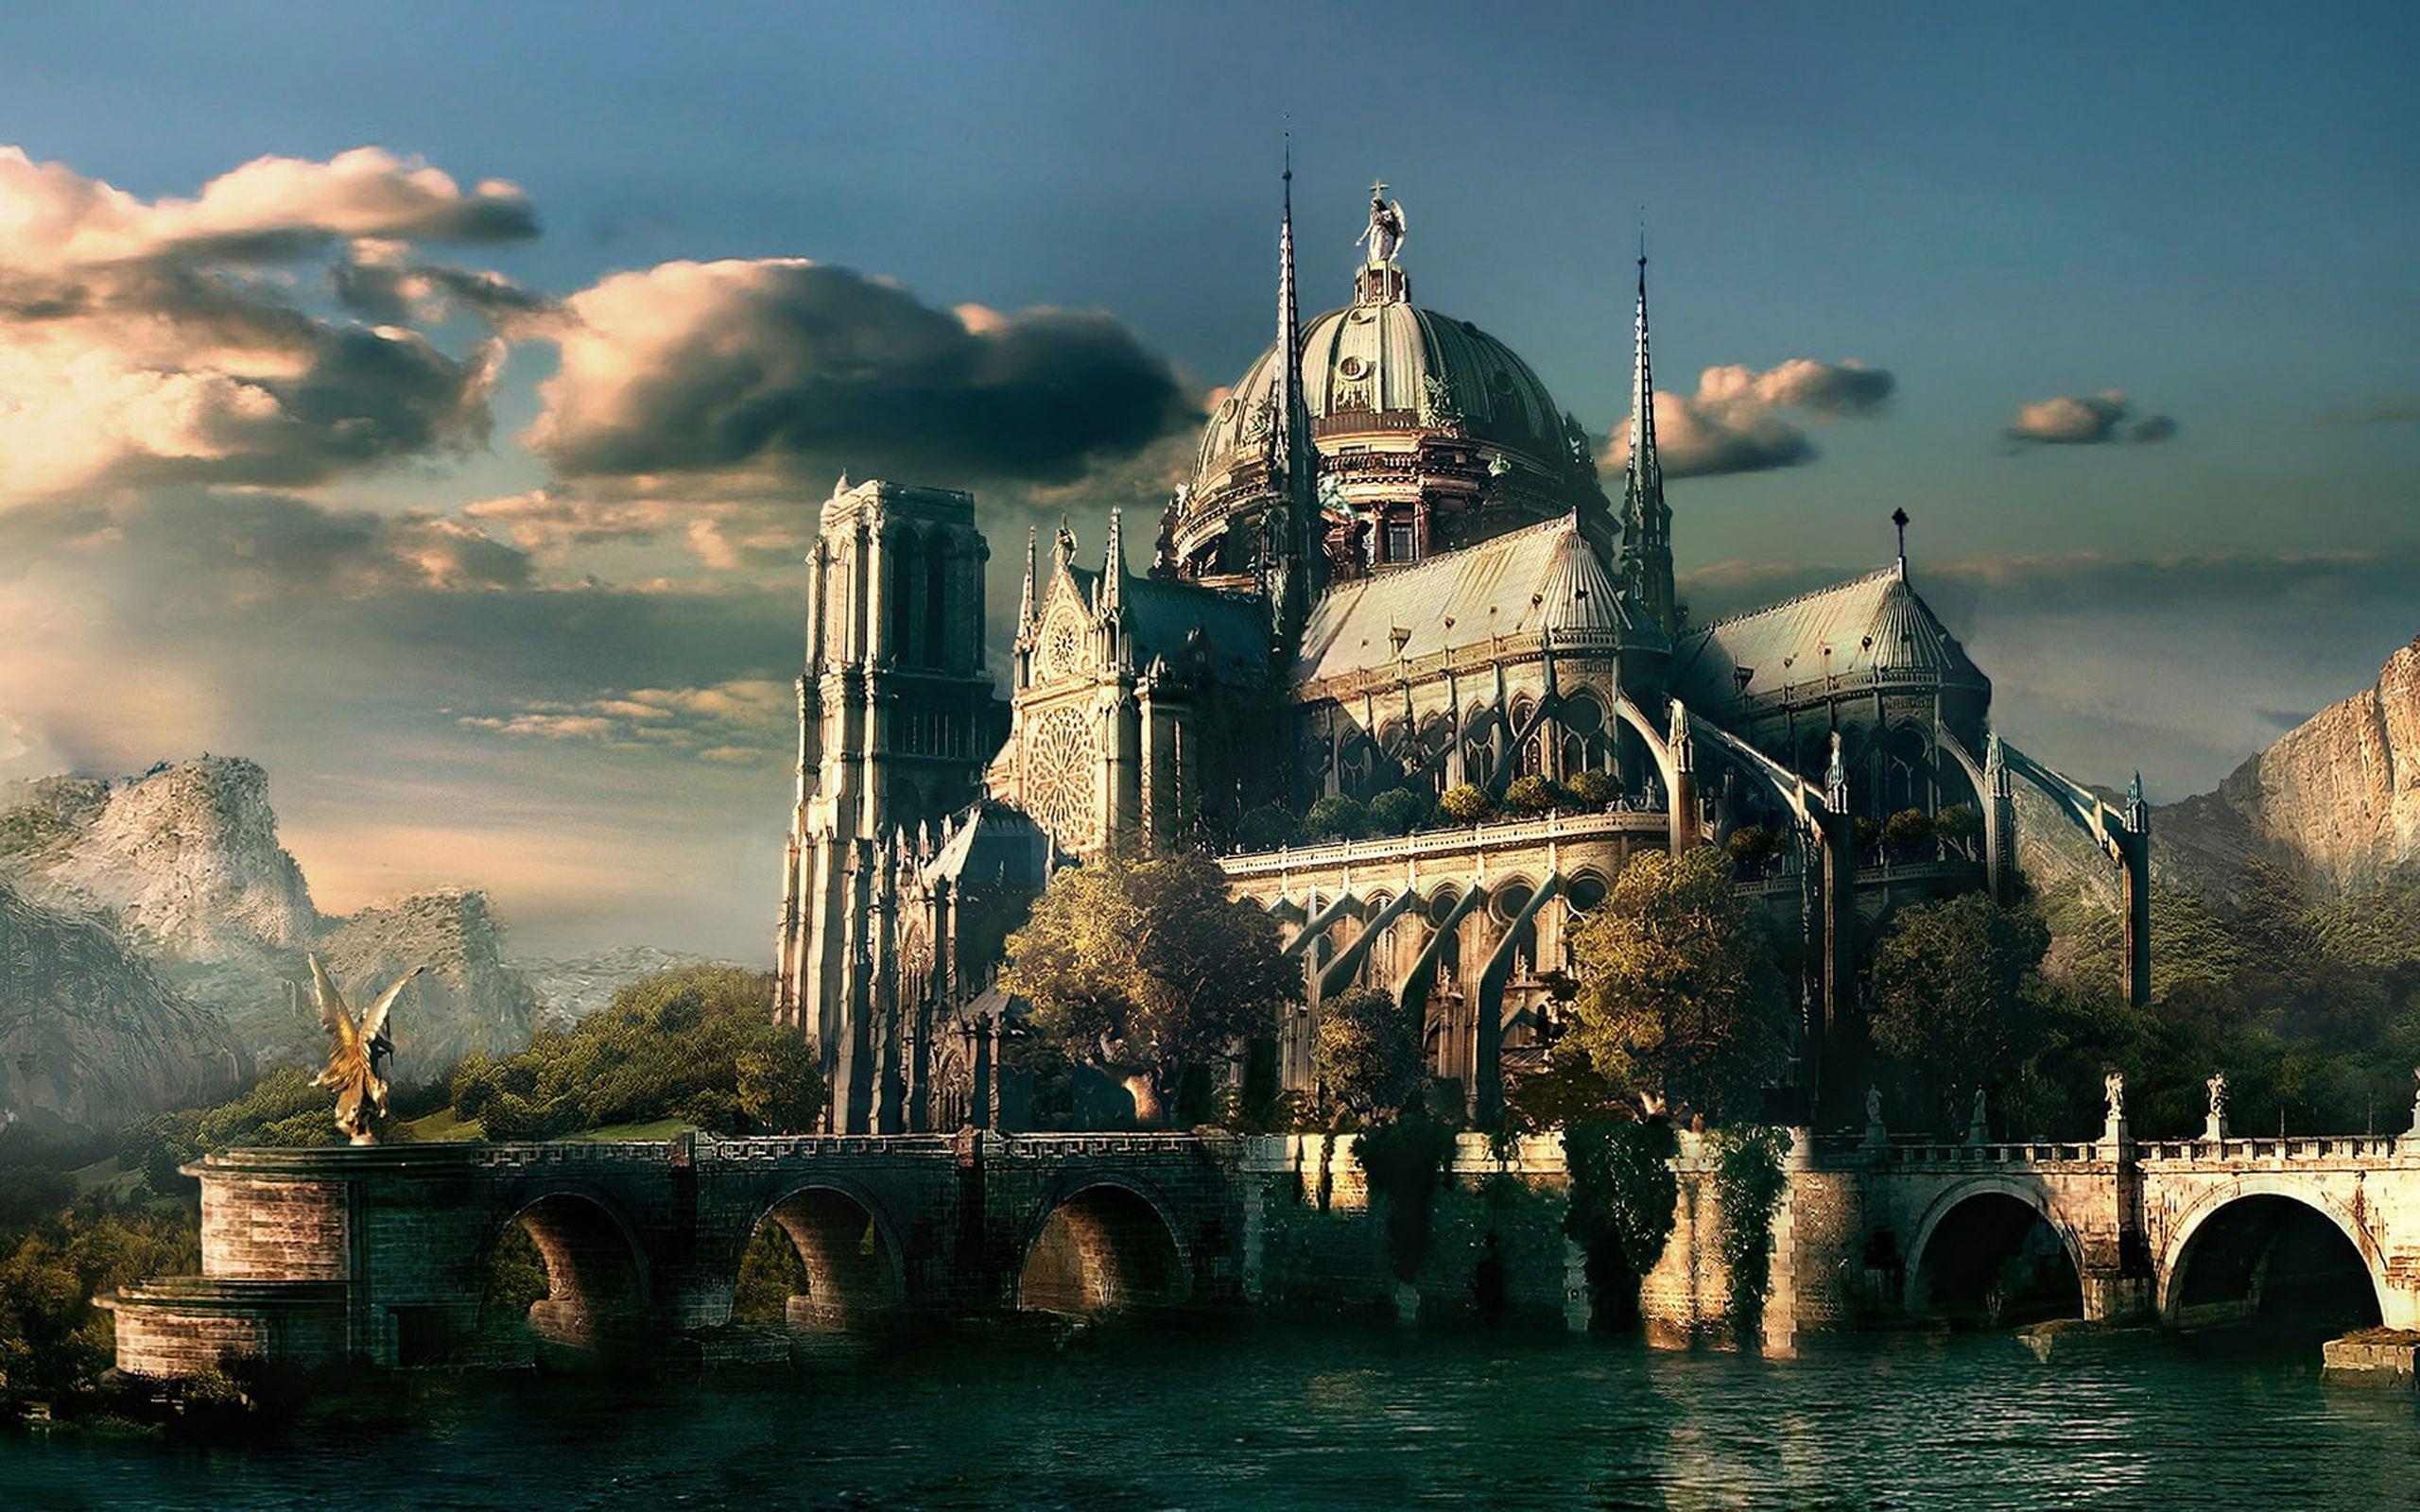 Castle from stories an art misc stuff wallpapers hd - Fantasy wallpaper 720p ...